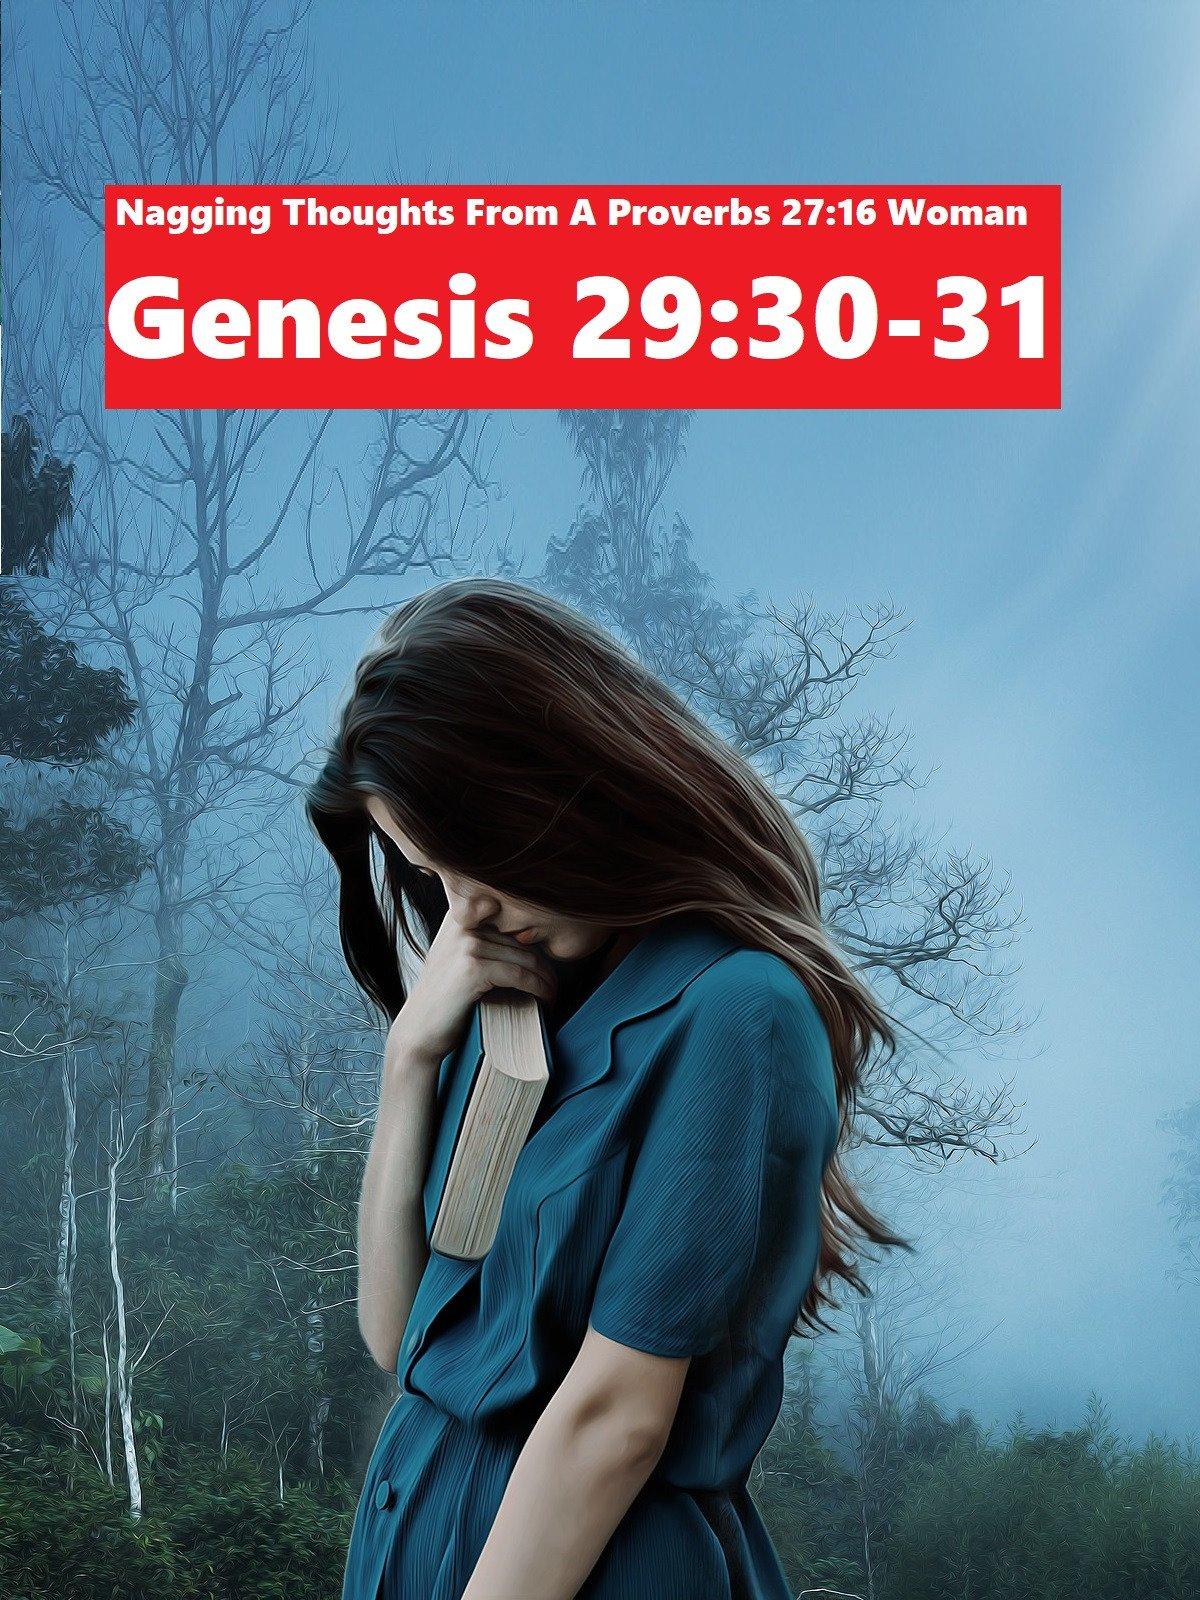 Nagging Thoughts: Genesis 29:30-31